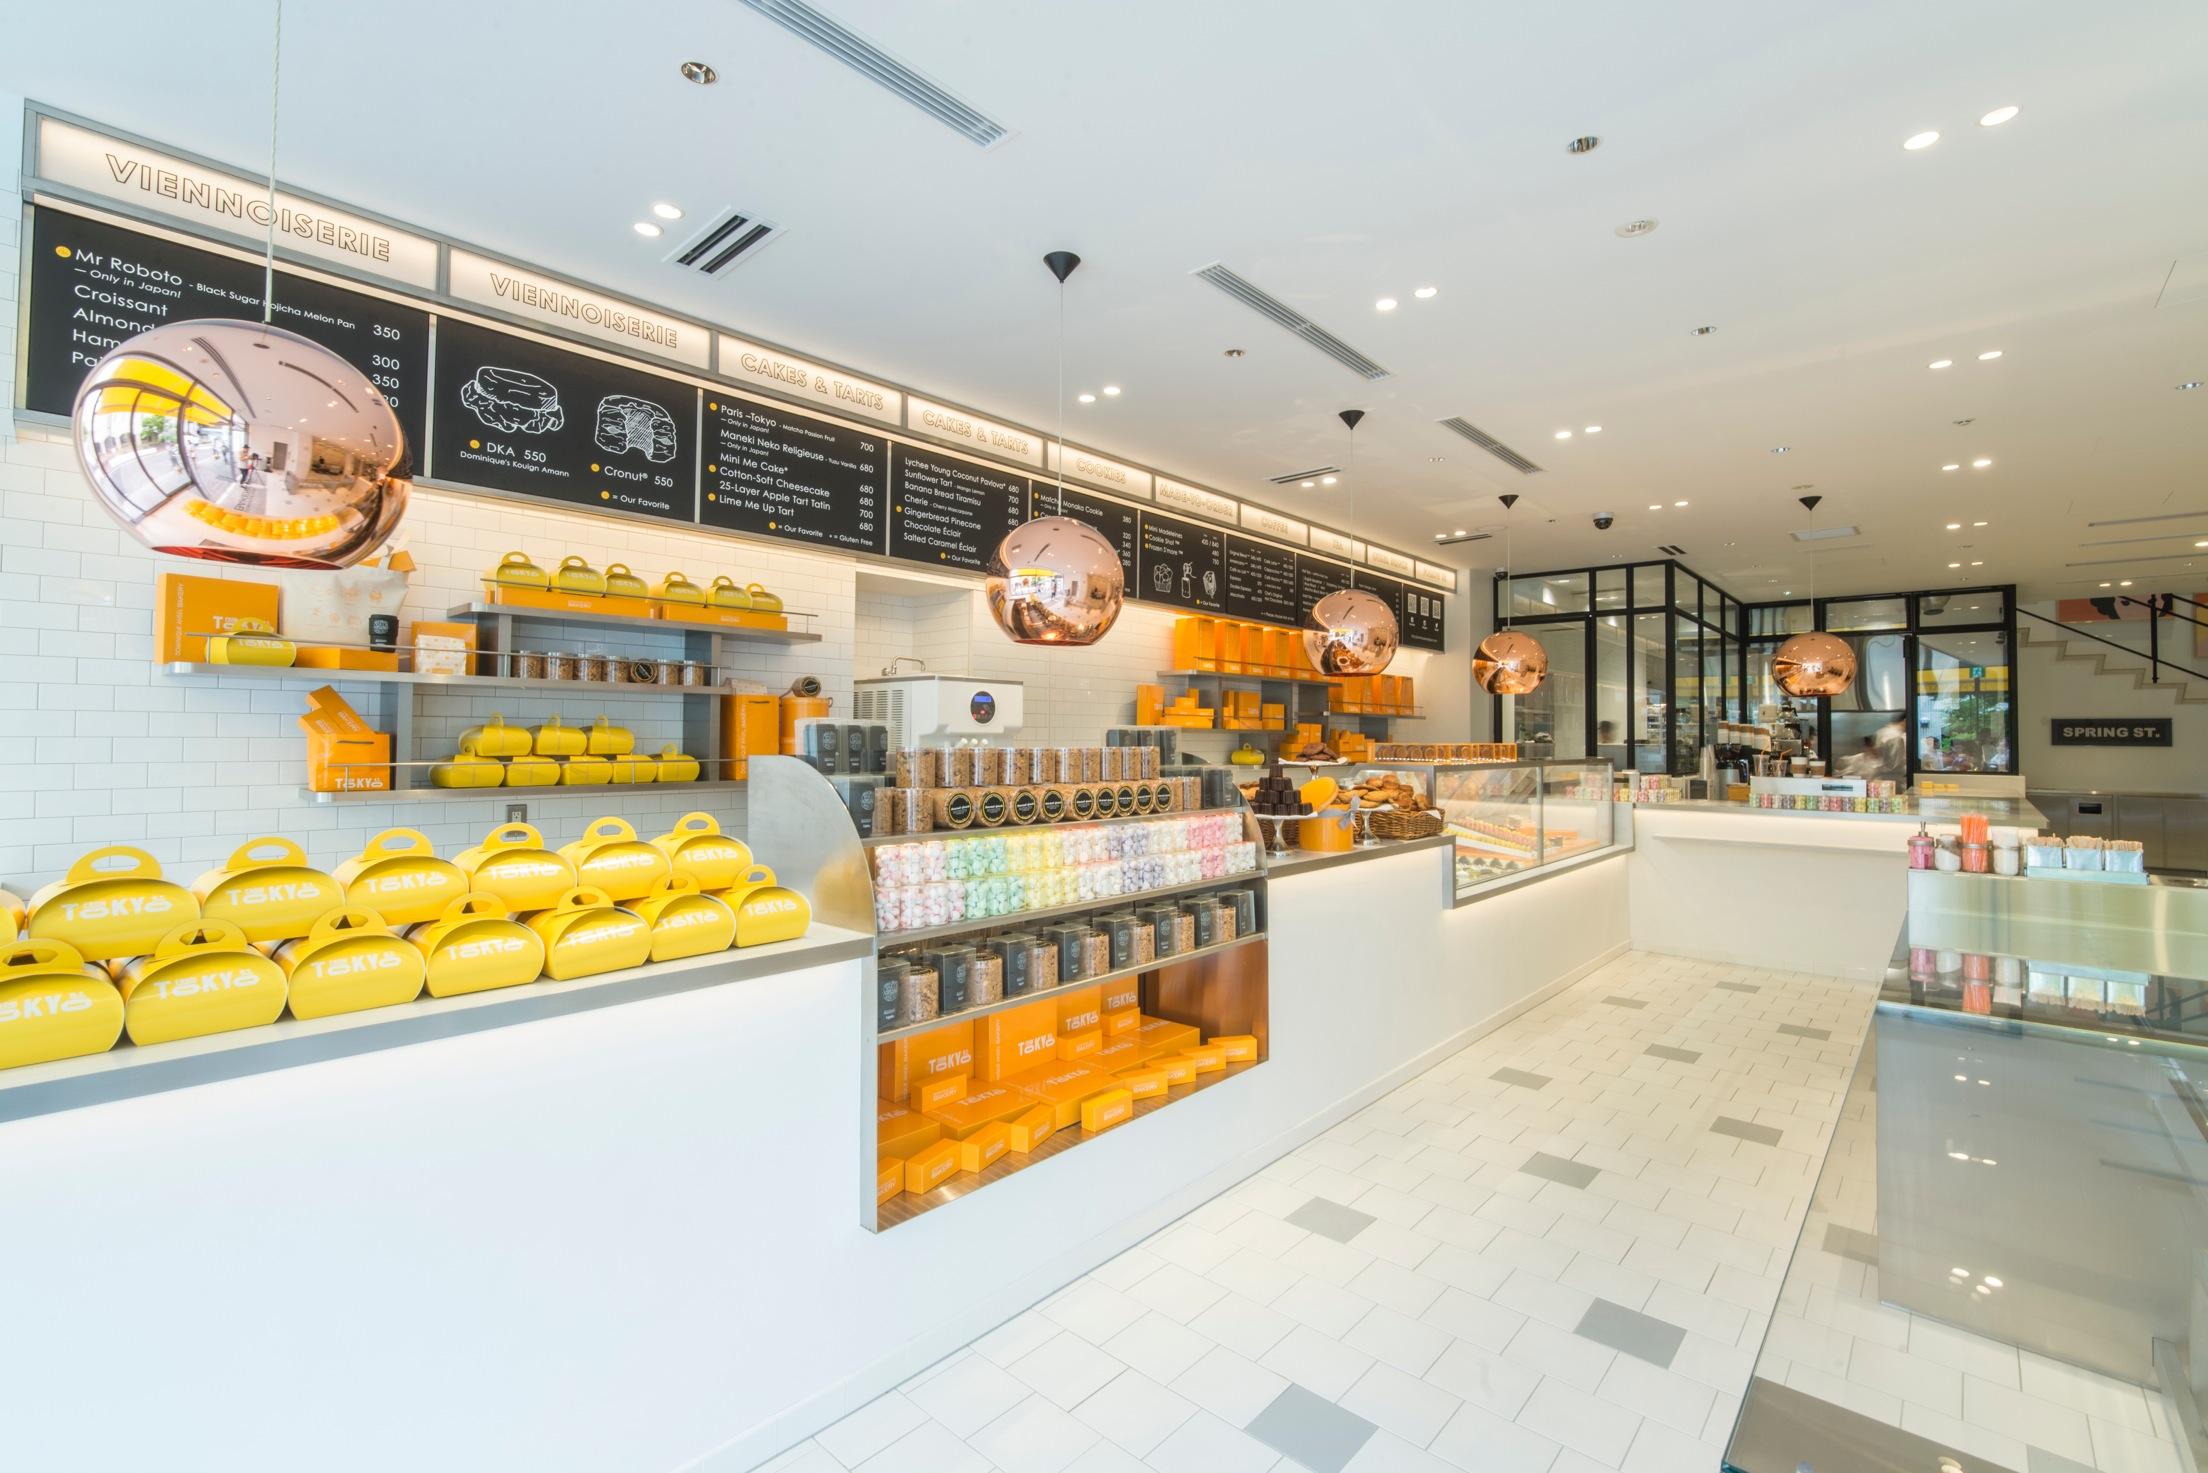 Dominique Ansel Bakery interior